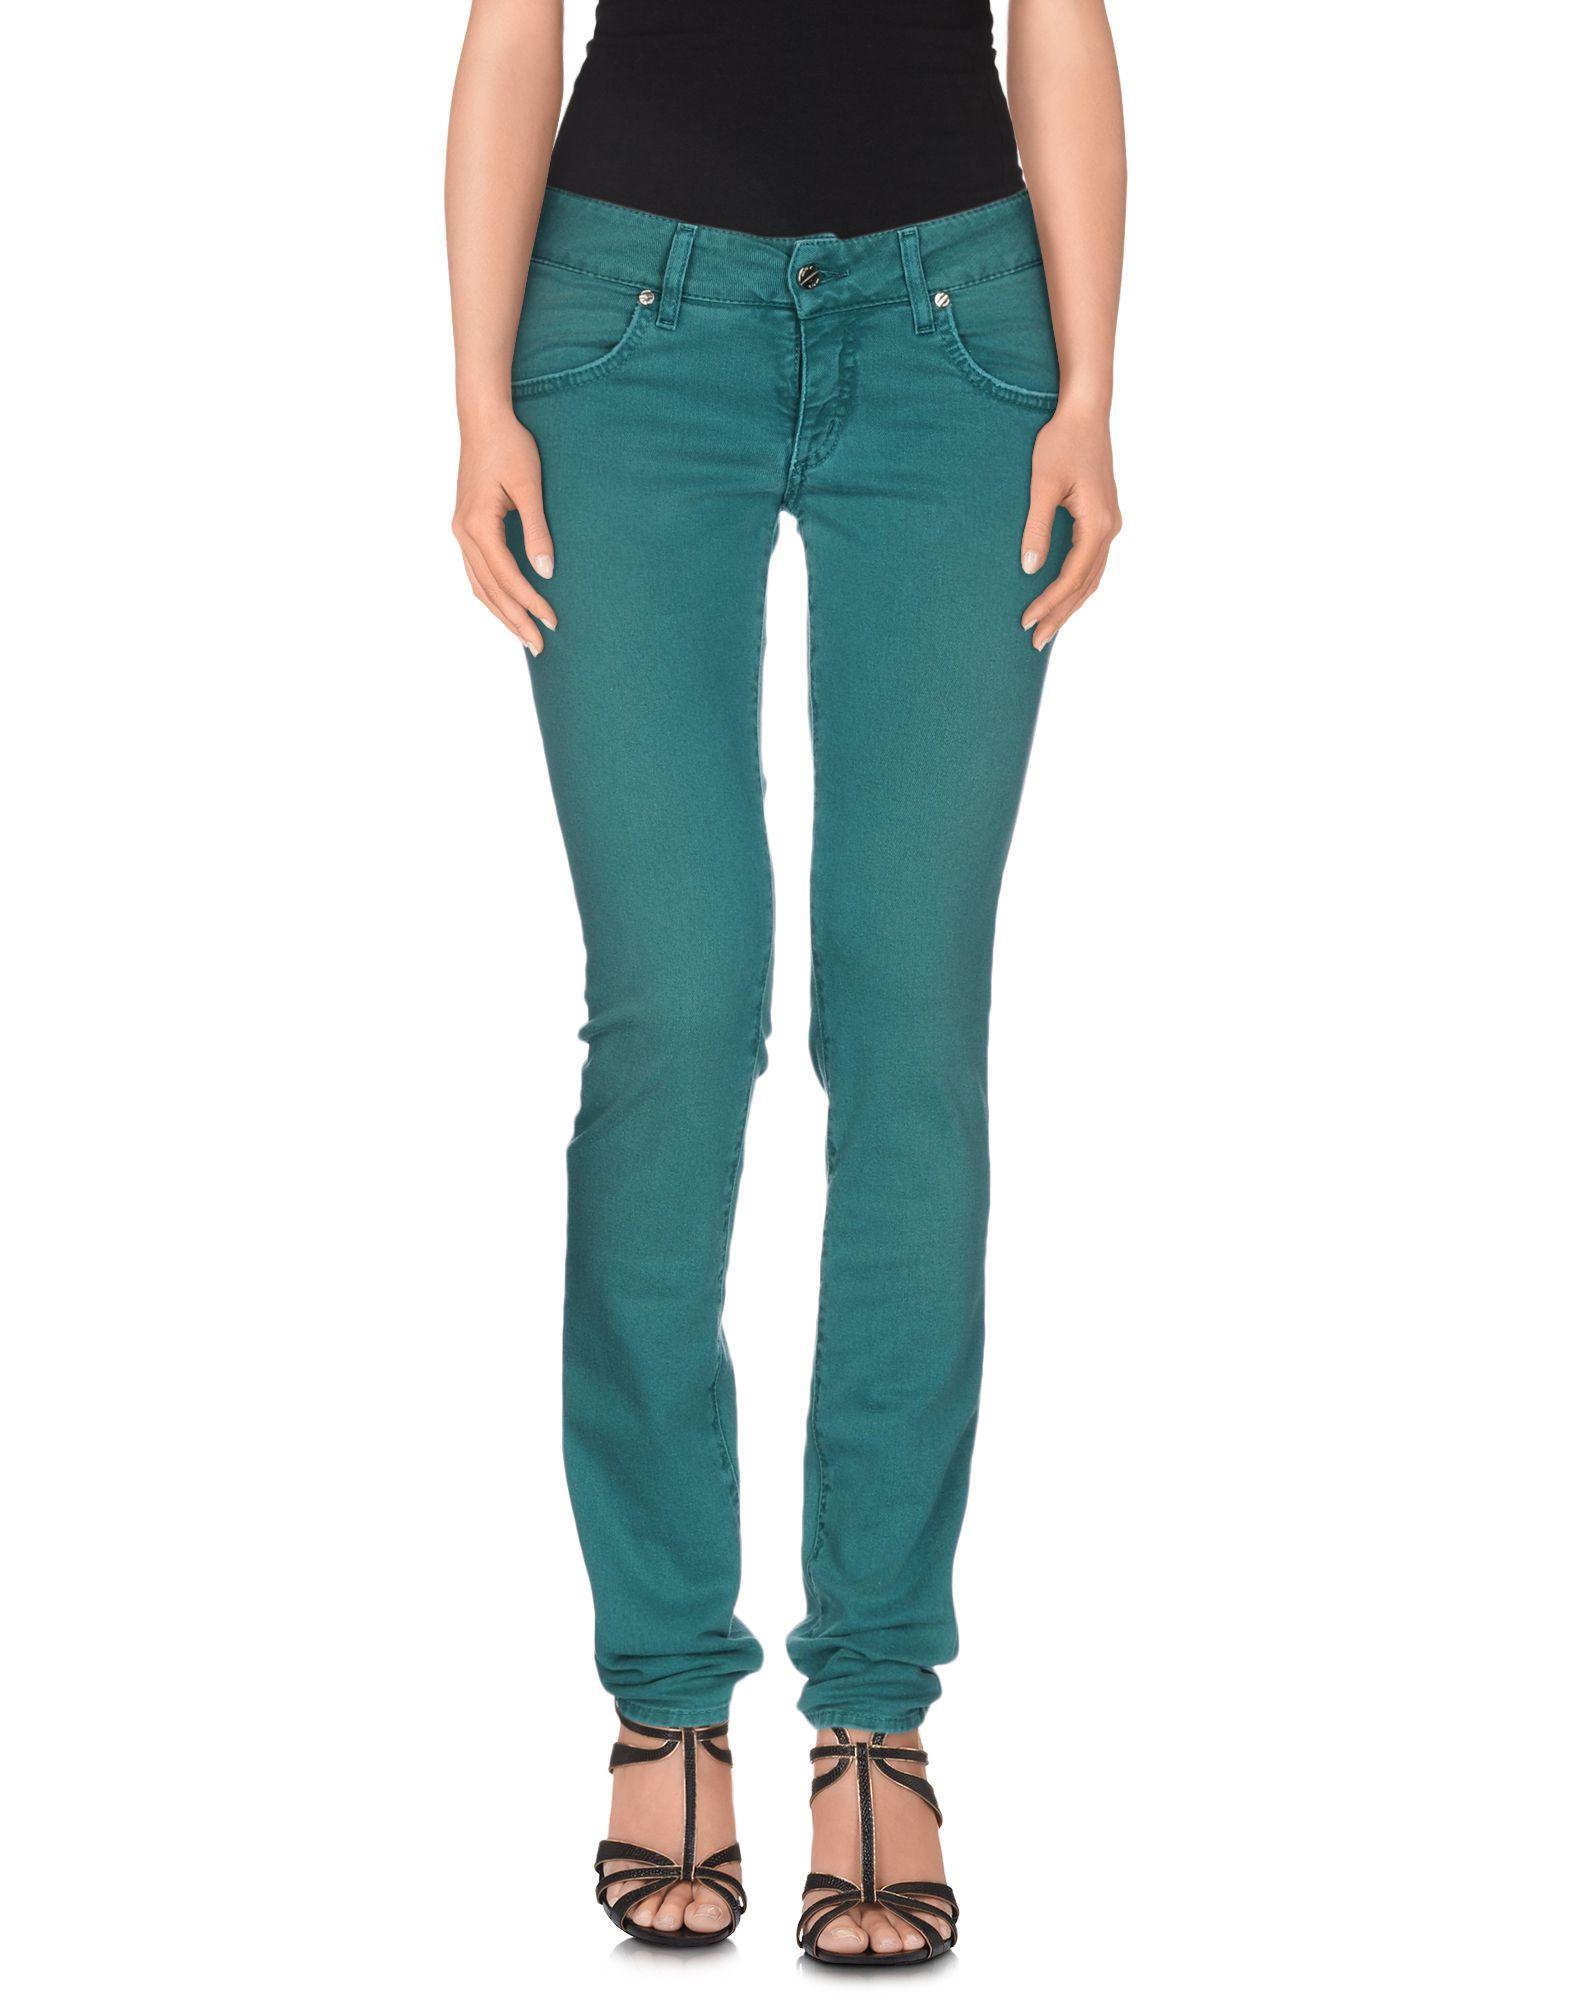 ФОТО met in jeans джинсовые брюки